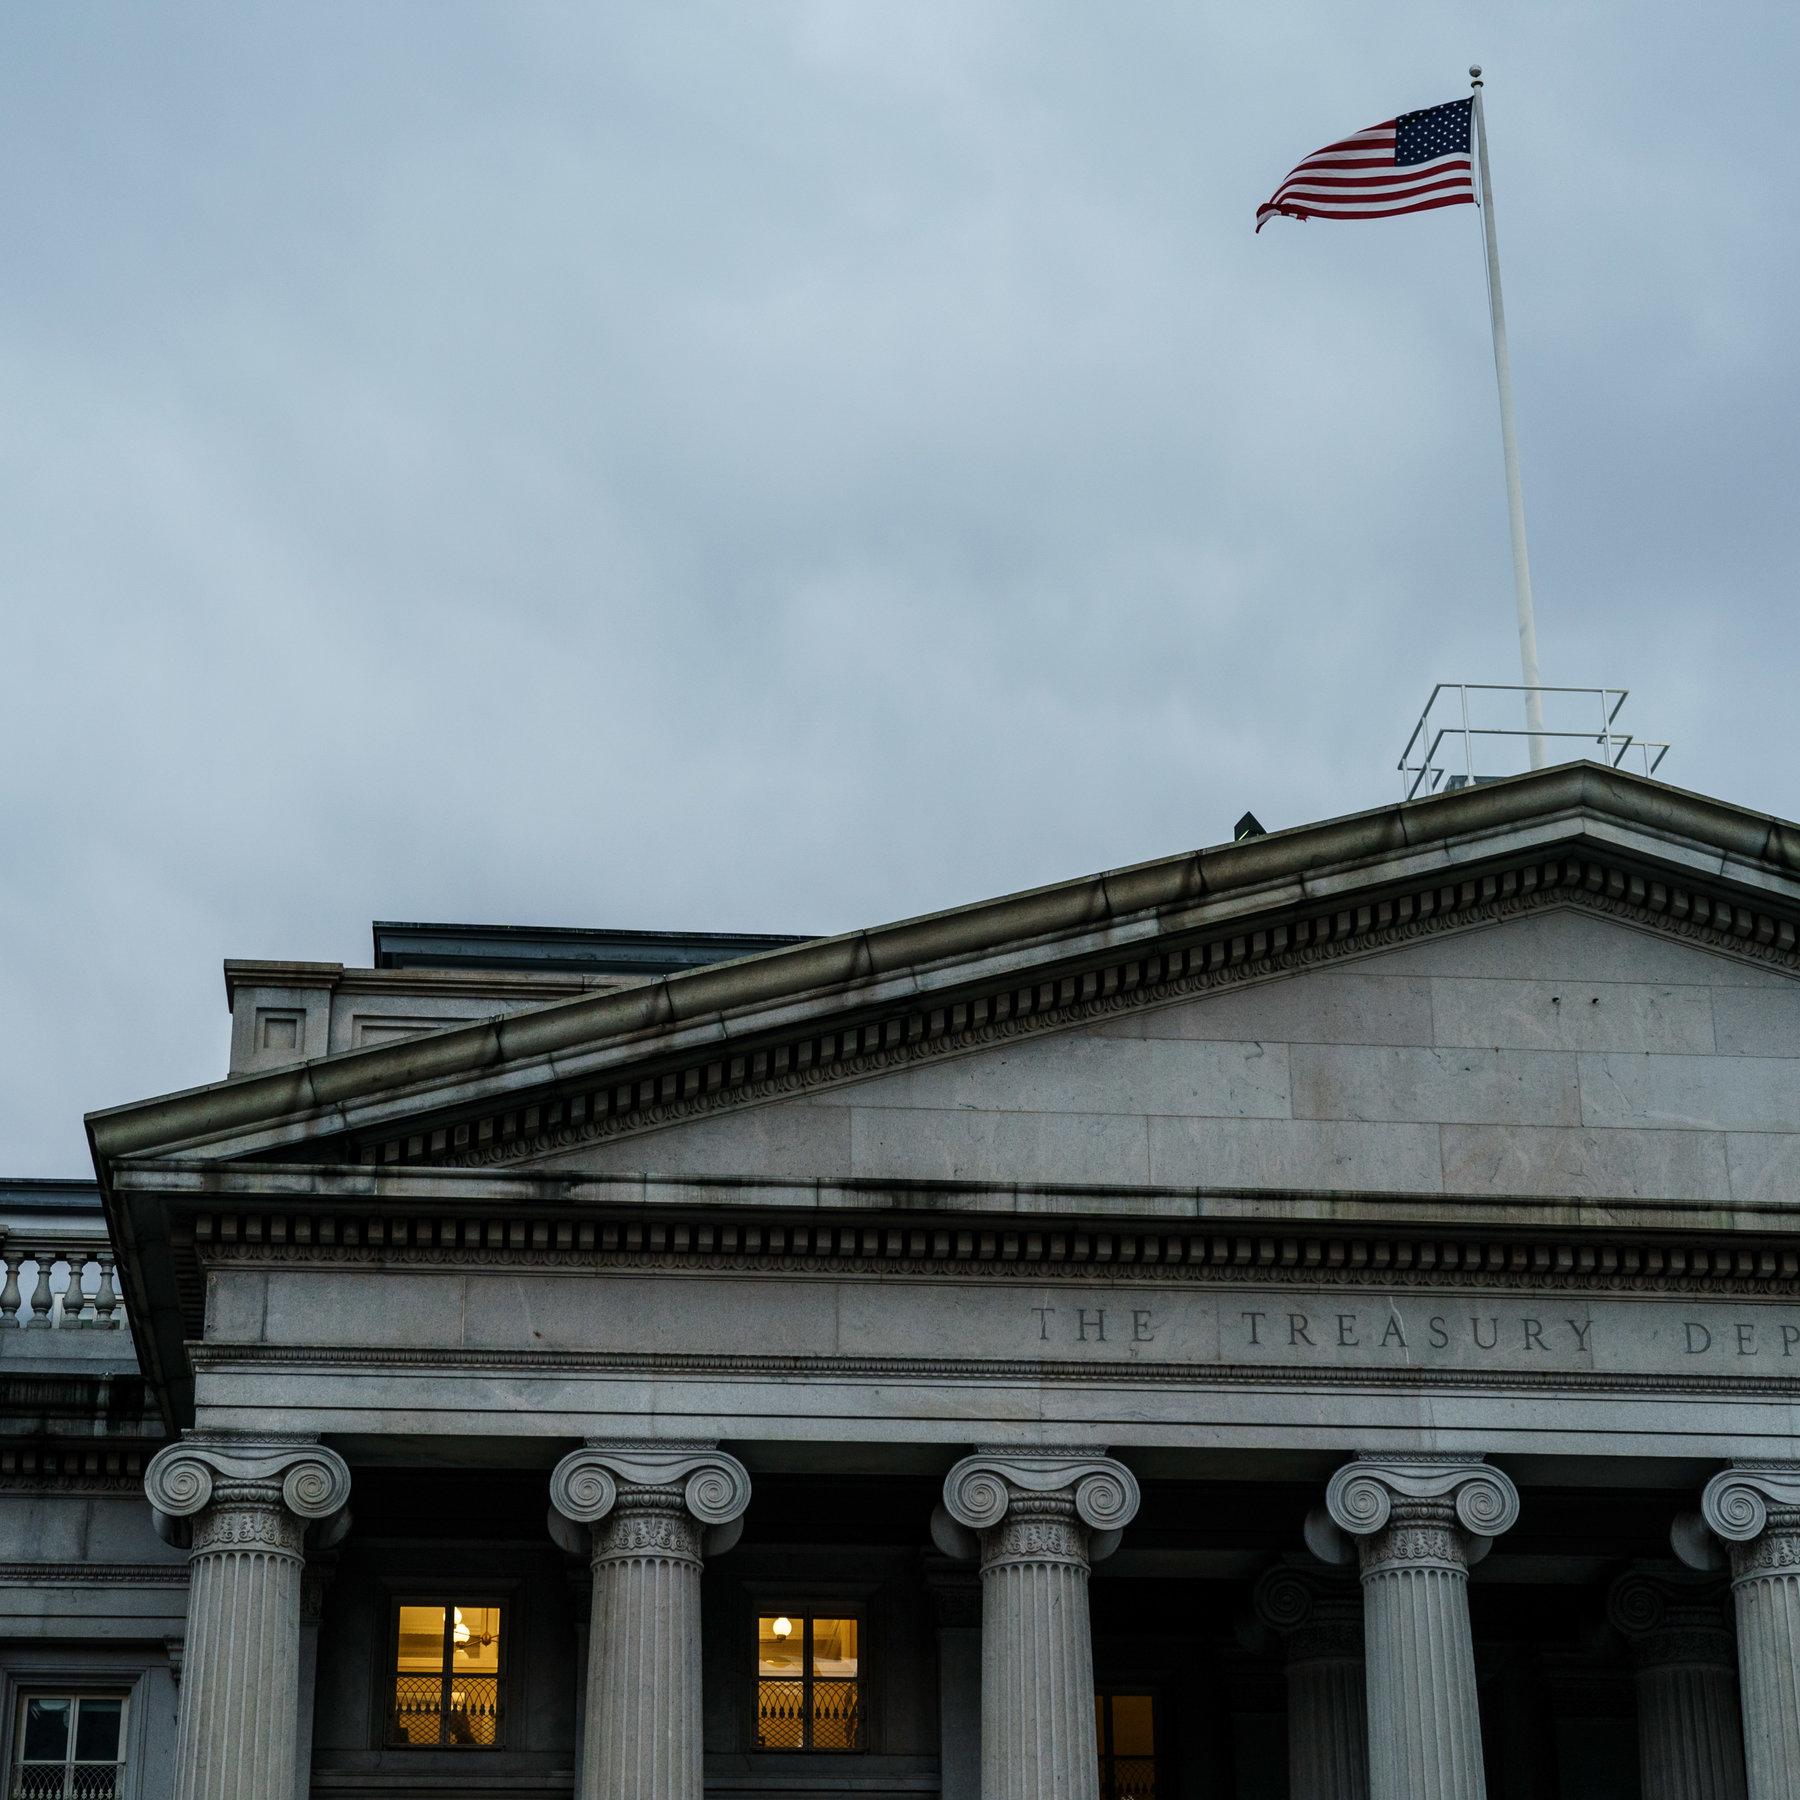 Washington Weighs Big Bailouts to Help U.S. Economy Survive ...